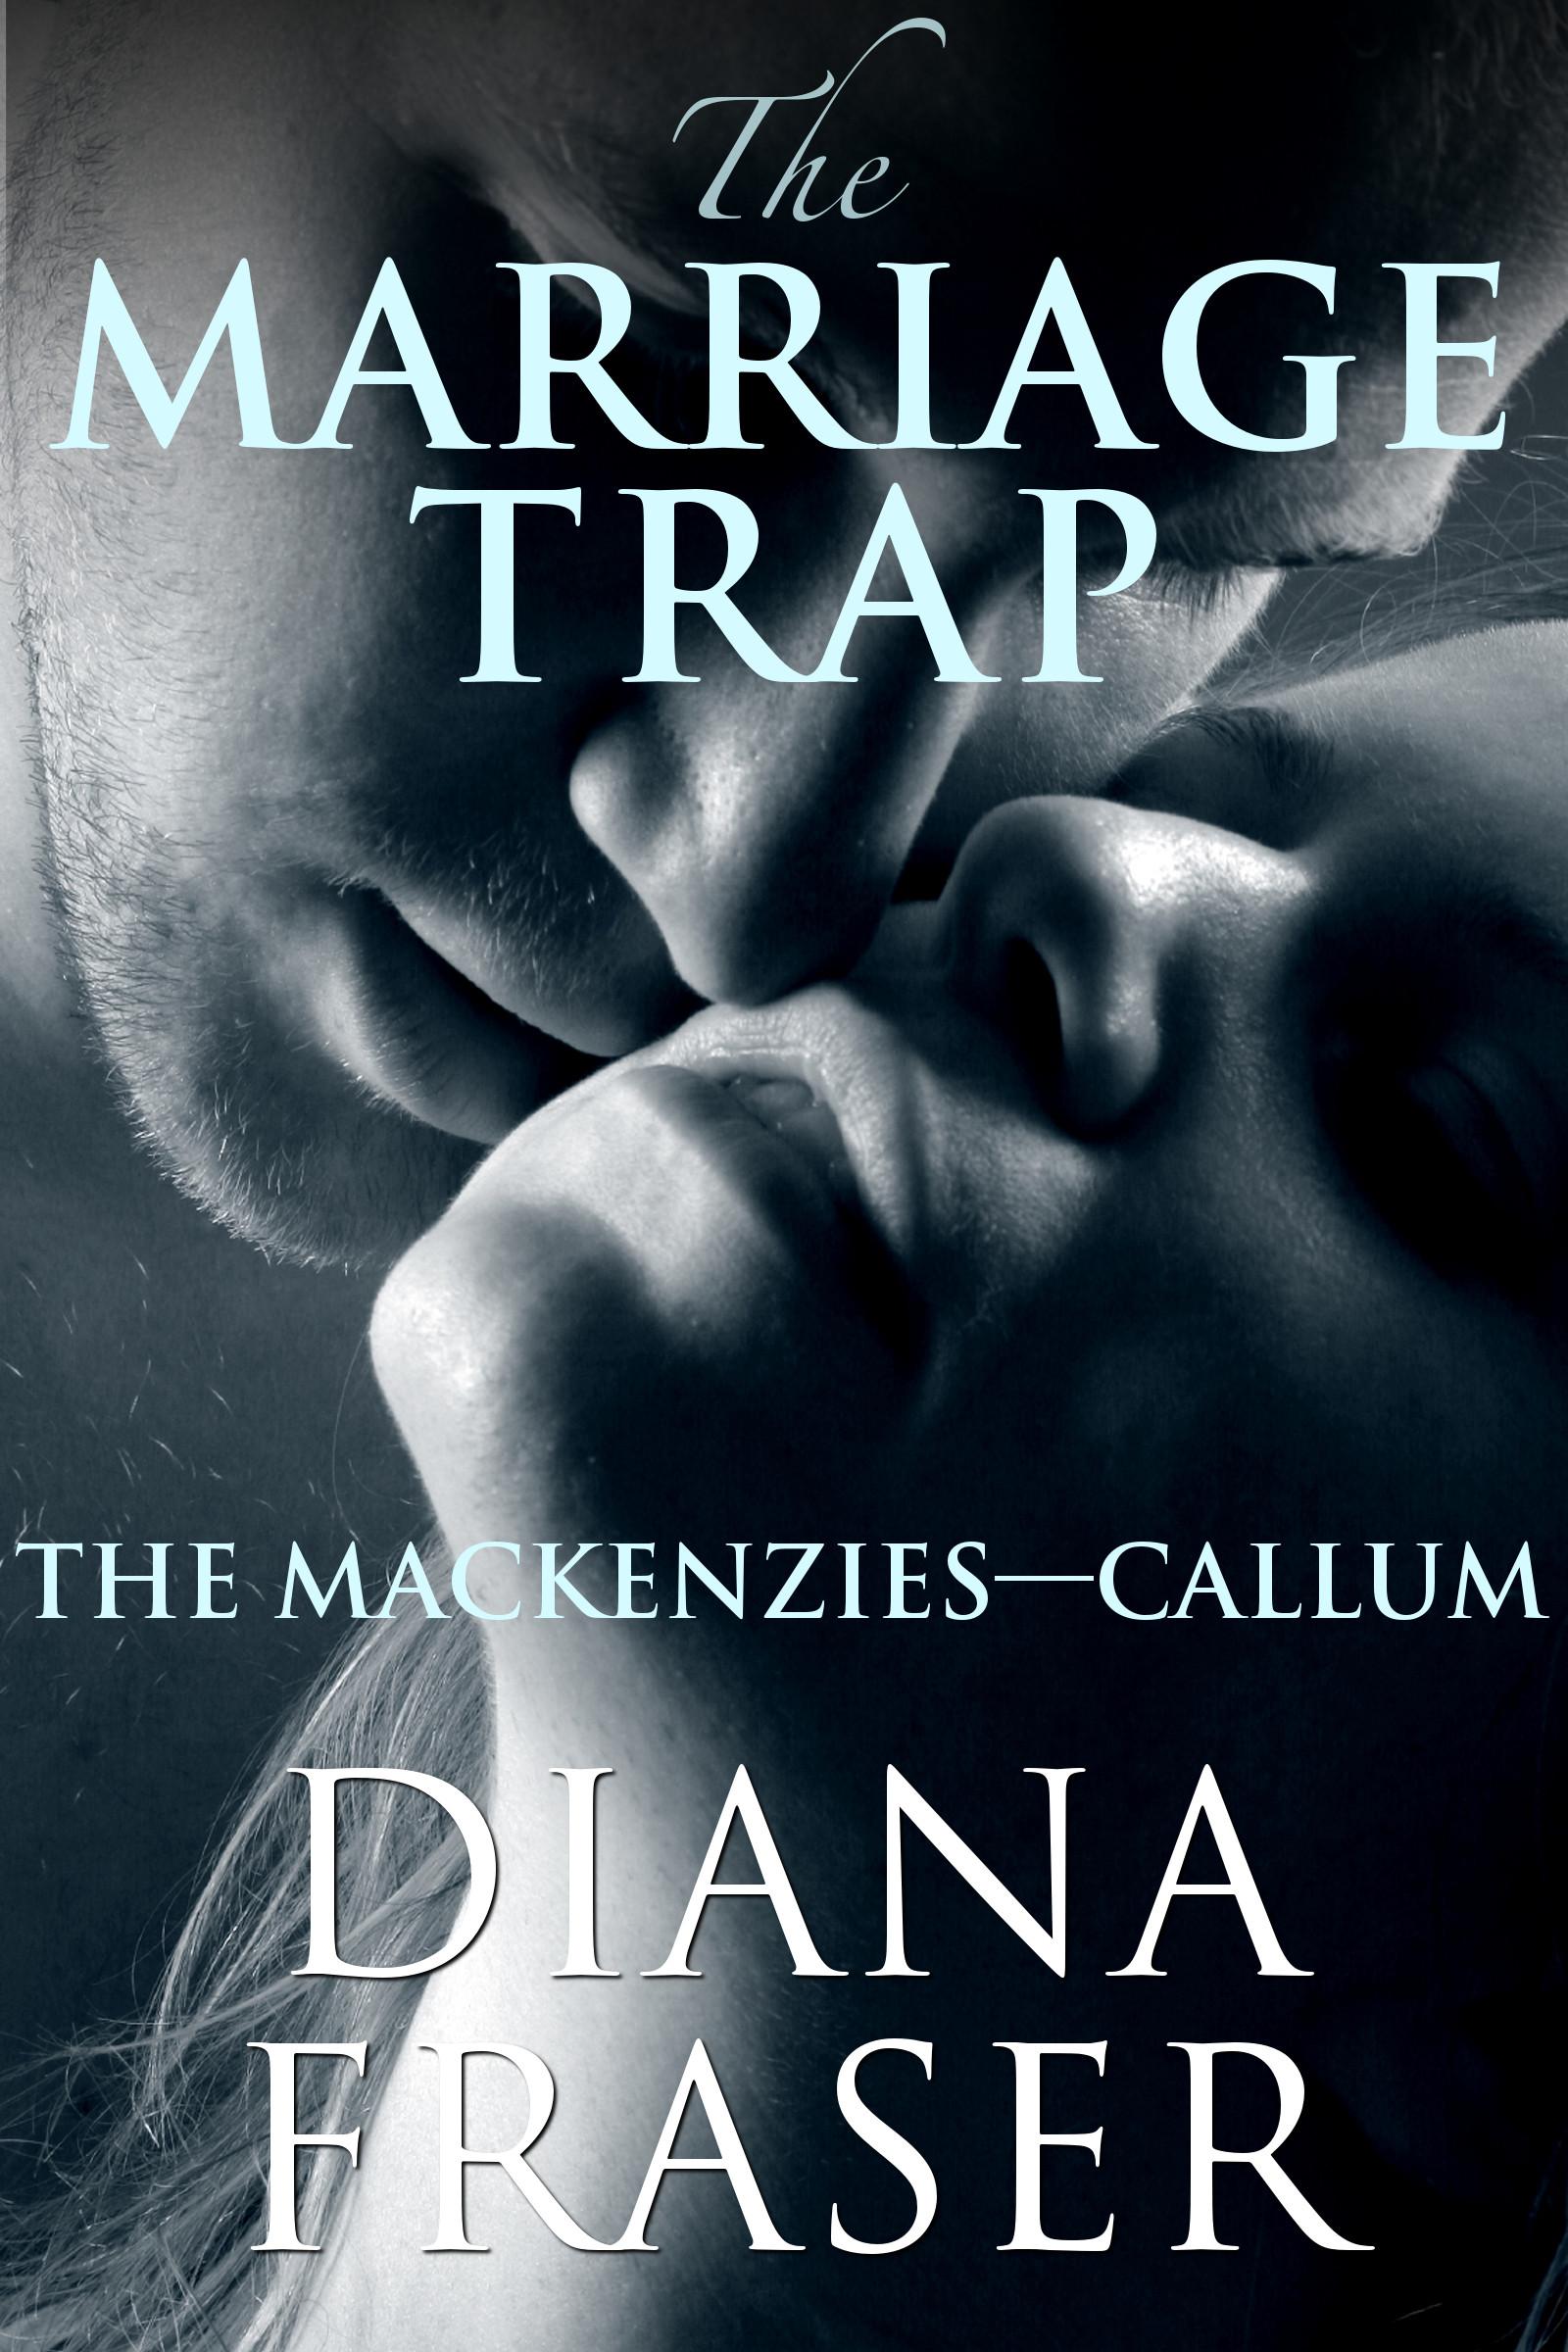 Diana Fraser - The Marriage Trap (The Mackenzies—Callum)